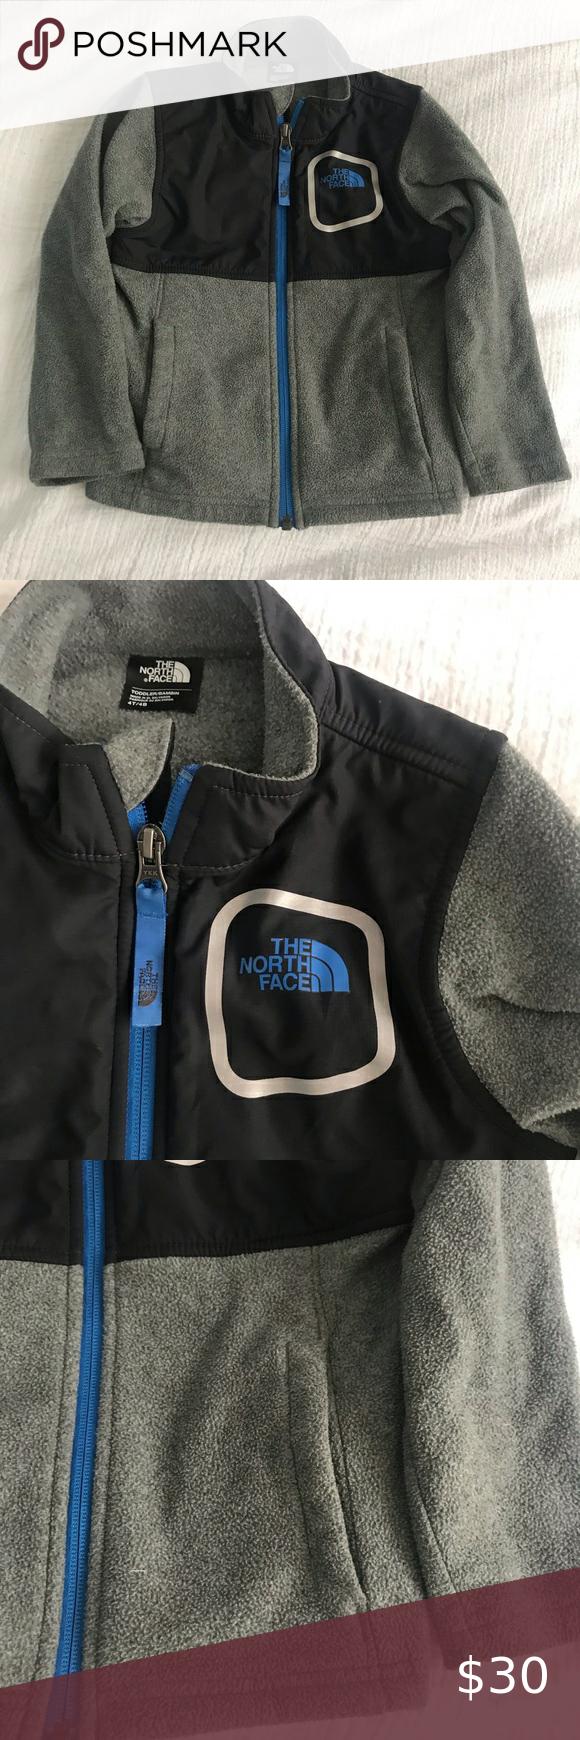 The North Face Fleece Zip Up Jacket Toddler 4t North Face Fleece The North Face Jackets [ 1740 x 580 Pixel ]